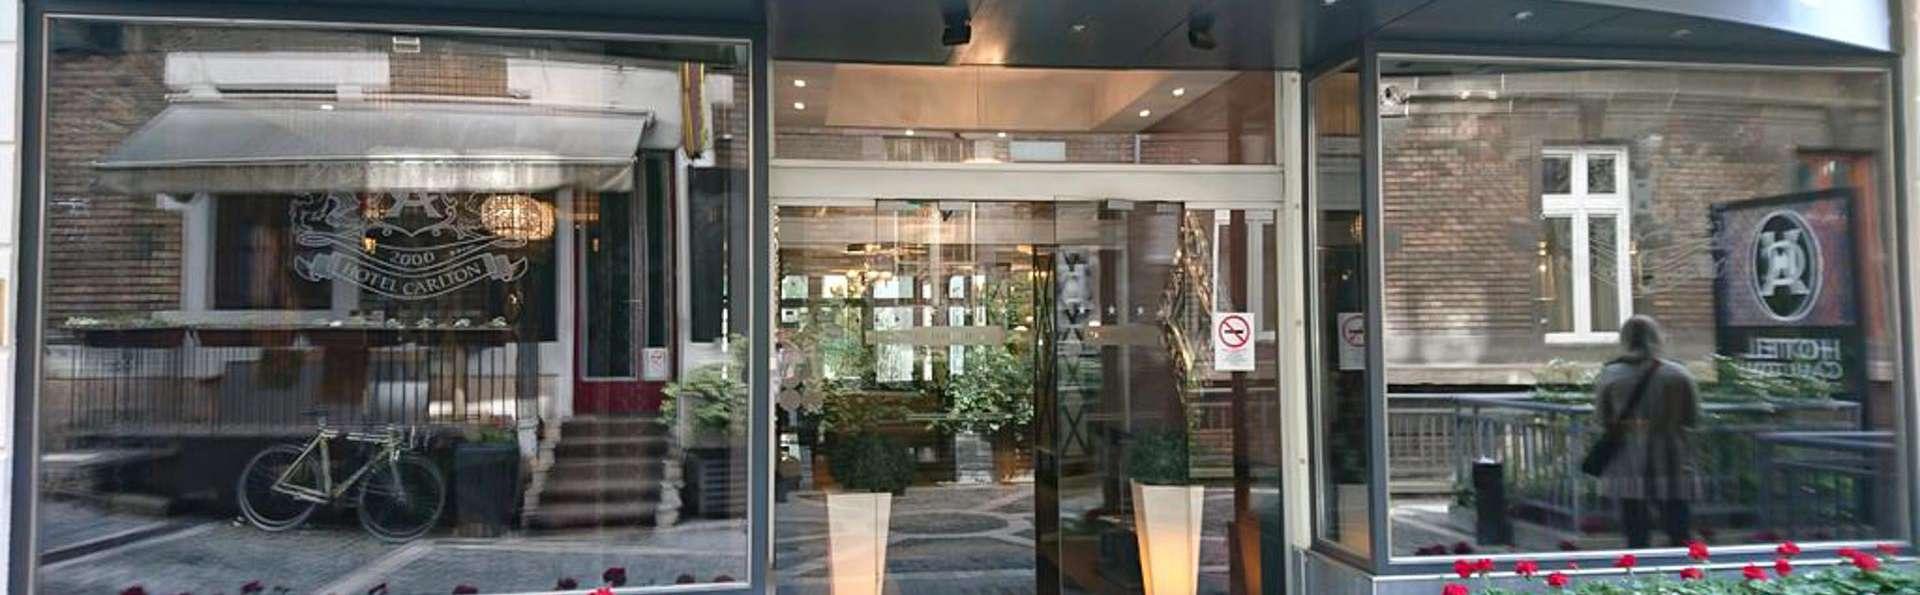 Carlton Hotel Budapest - EDIT_WEB_FRONT_02.jpg